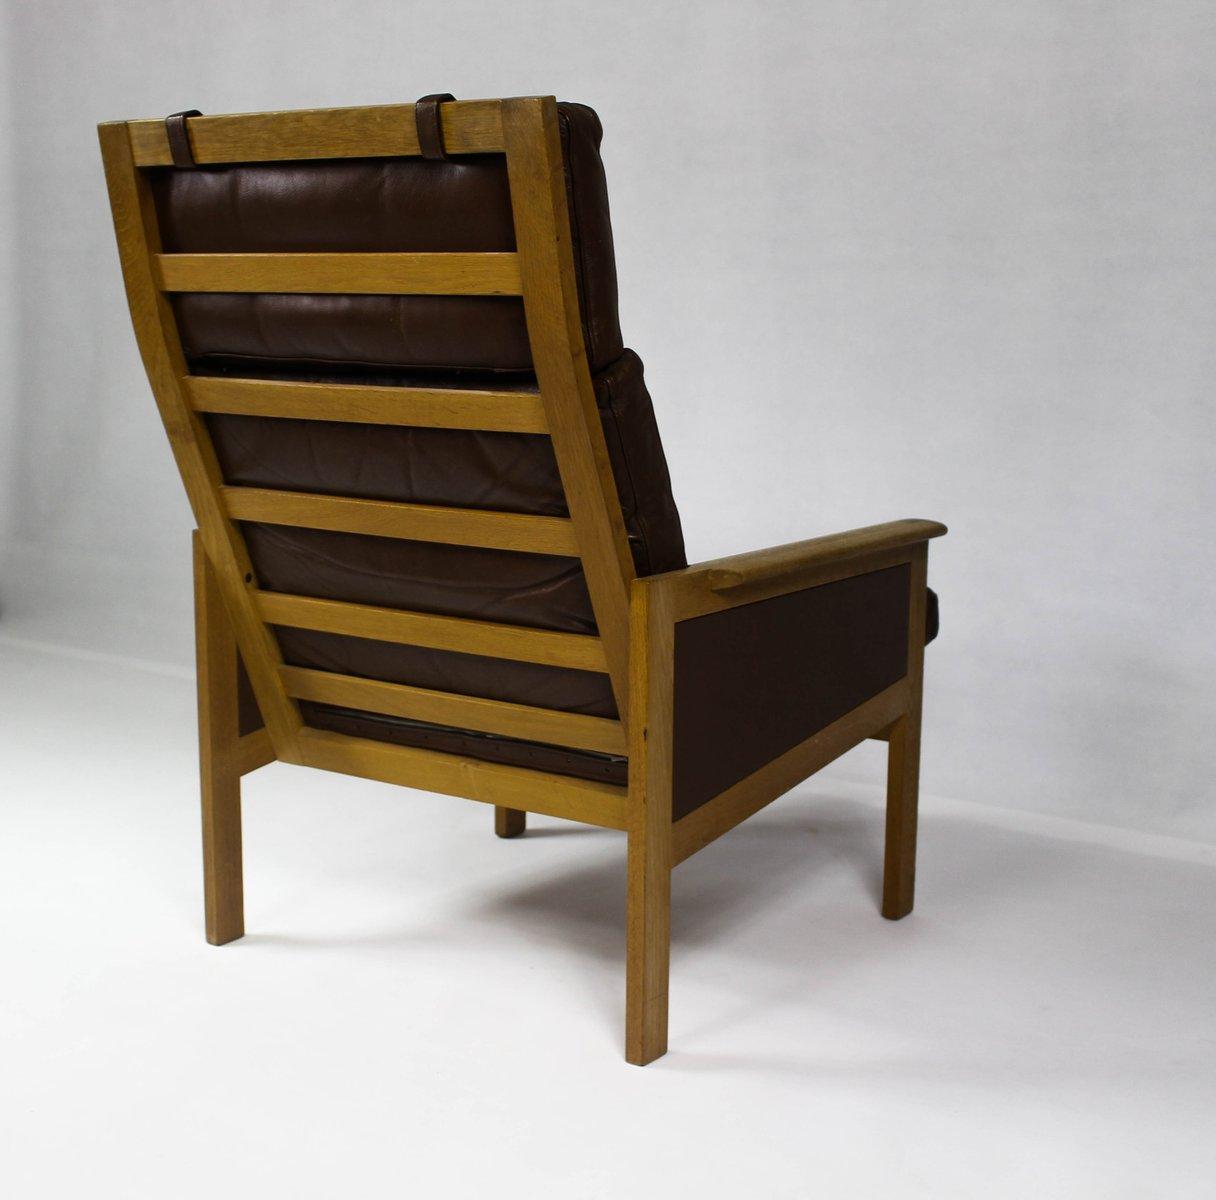 schwarzer d nischer vintage capella sessel mit hoher. Black Bedroom Furniture Sets. Home Design Ideas